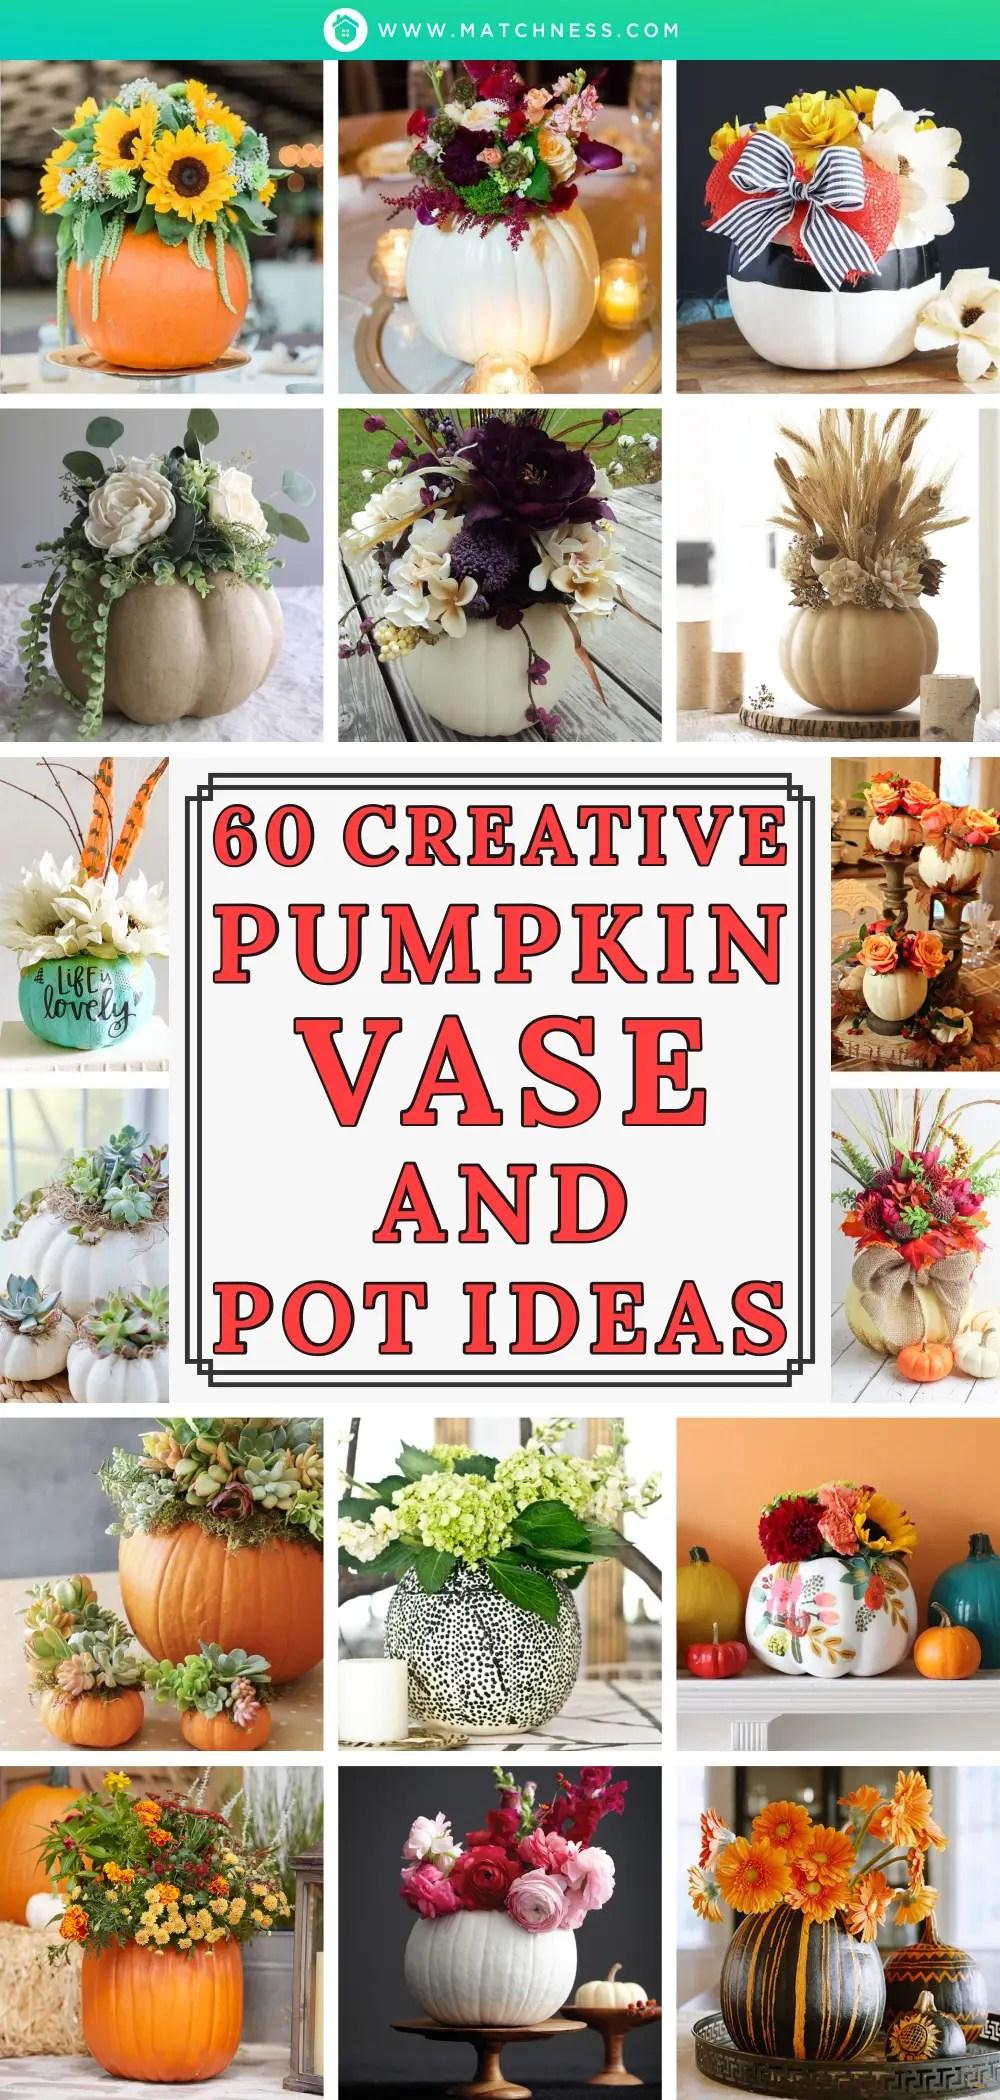 60-creative-pumpkin-vase-and-pot-ideas1